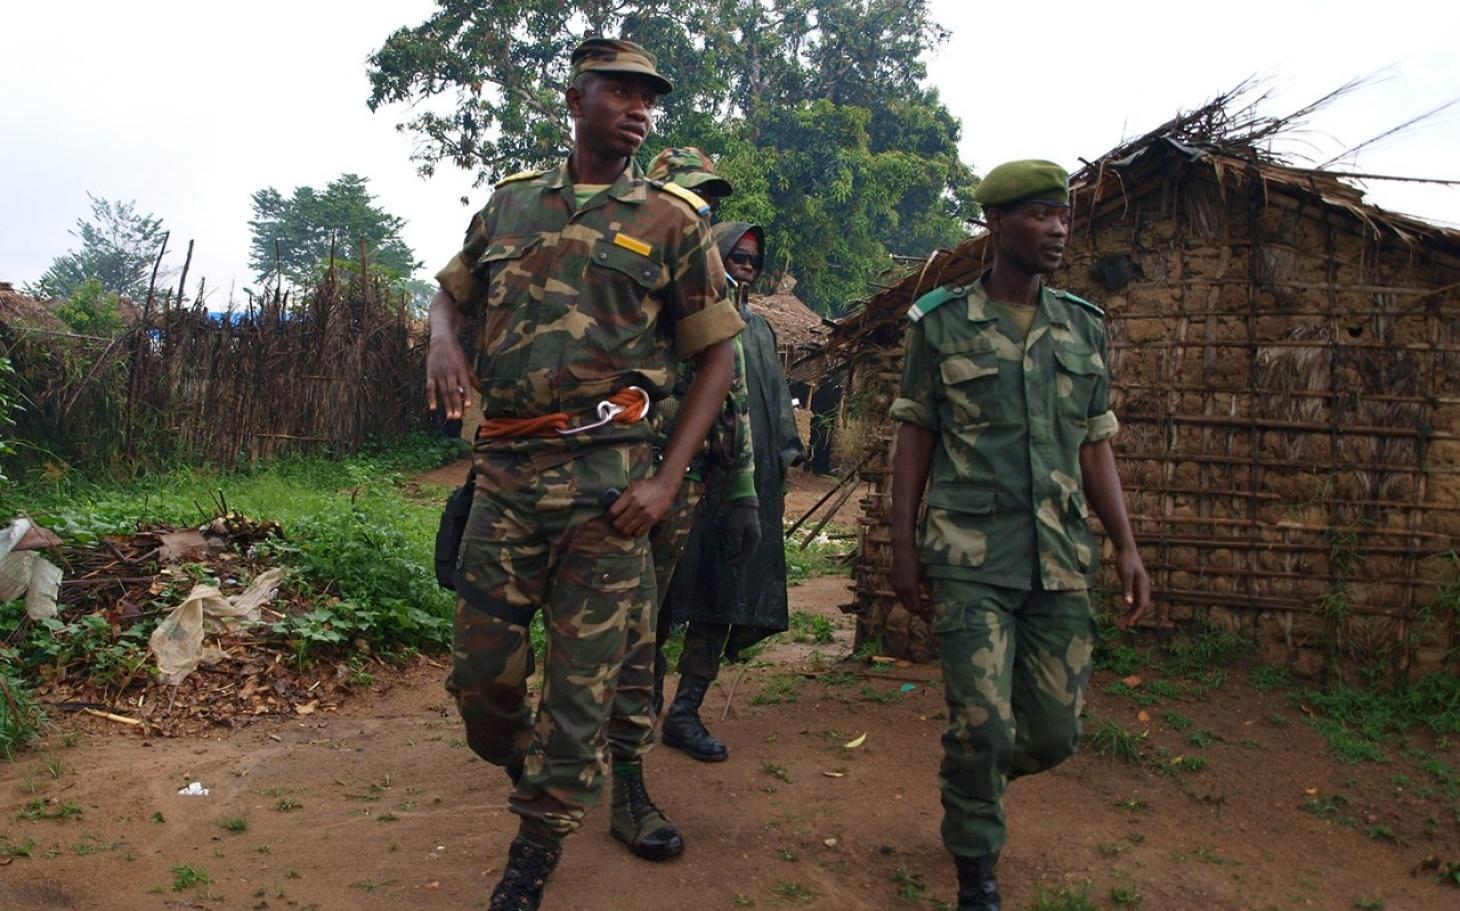 Children 'bashed against walls' in DR Congo massacre ... | 1460 x 911 jpeg 938kB